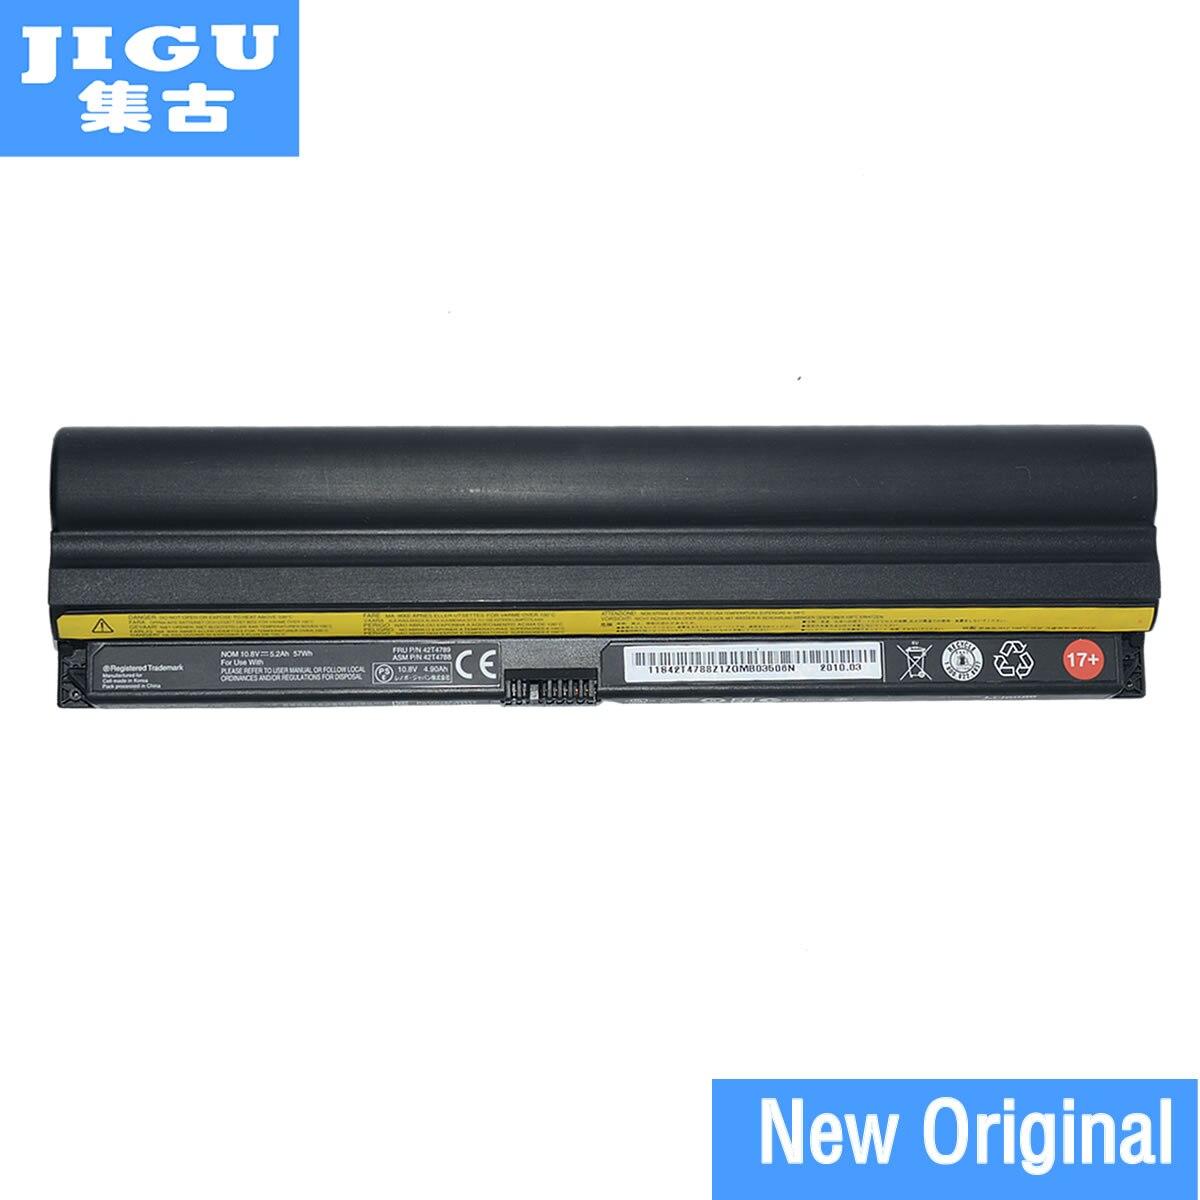 JIGU Original laptop Battery For LENOVO for ThinkPad Edge 11 E10 mini 10 X100e X120e 10.8V 57WH 6CELLS